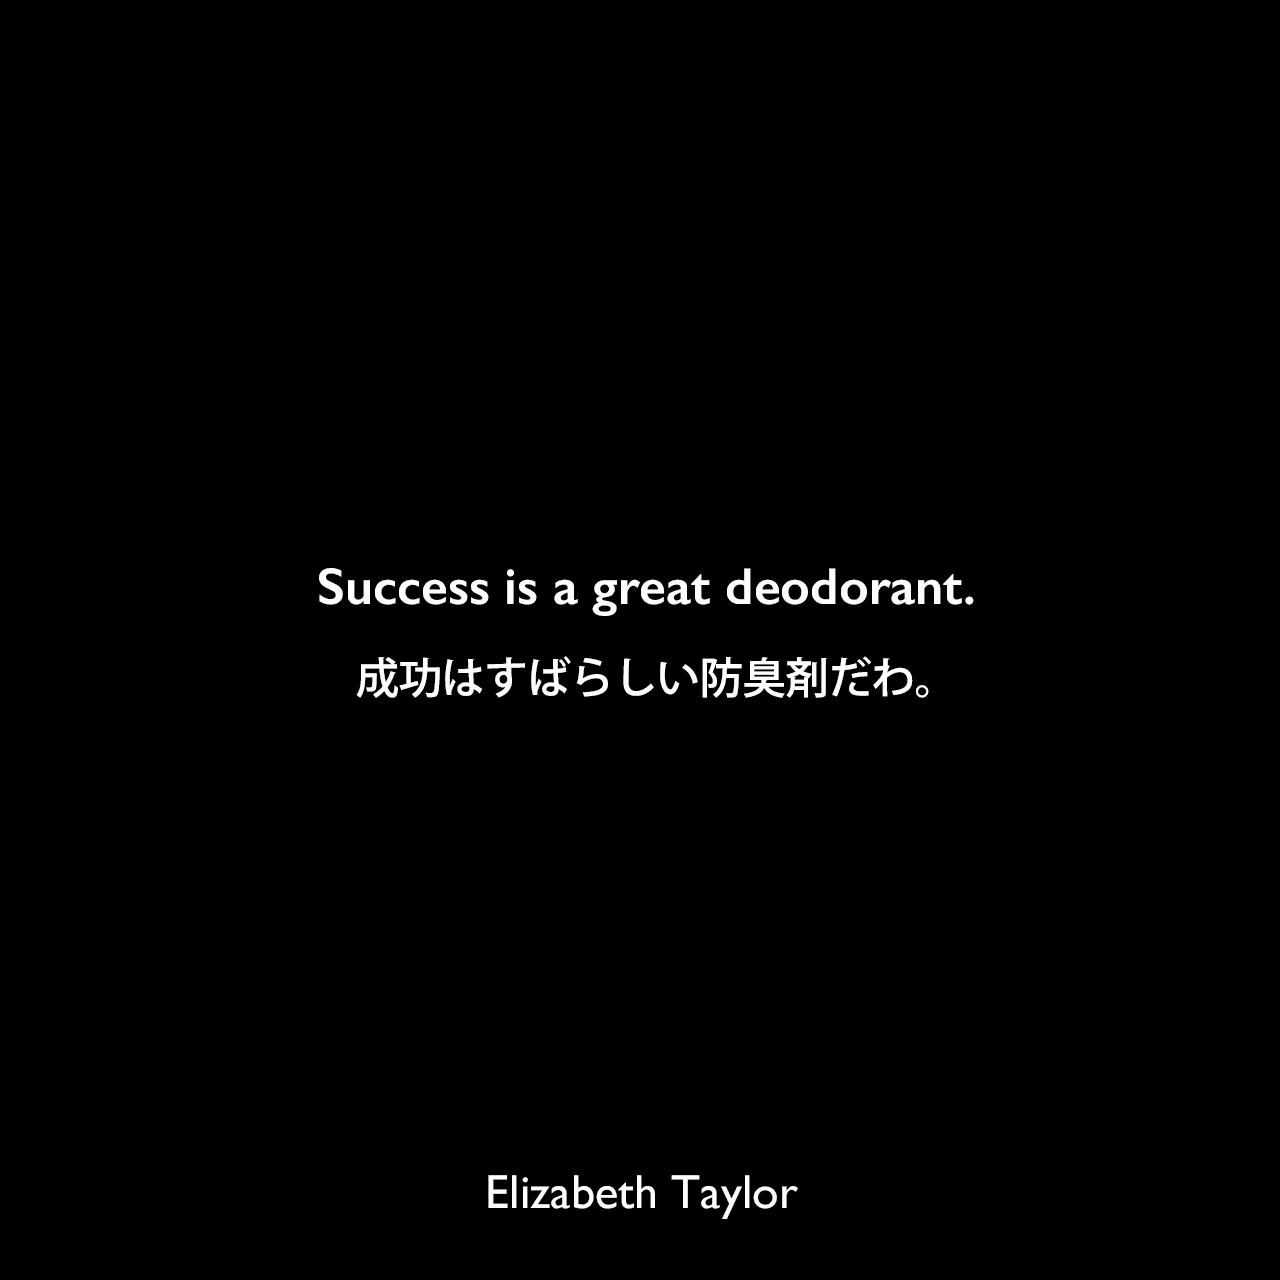 Success is a great deodorant.成功はすばらしい防臭剤だわ。Elizabeth Taylor